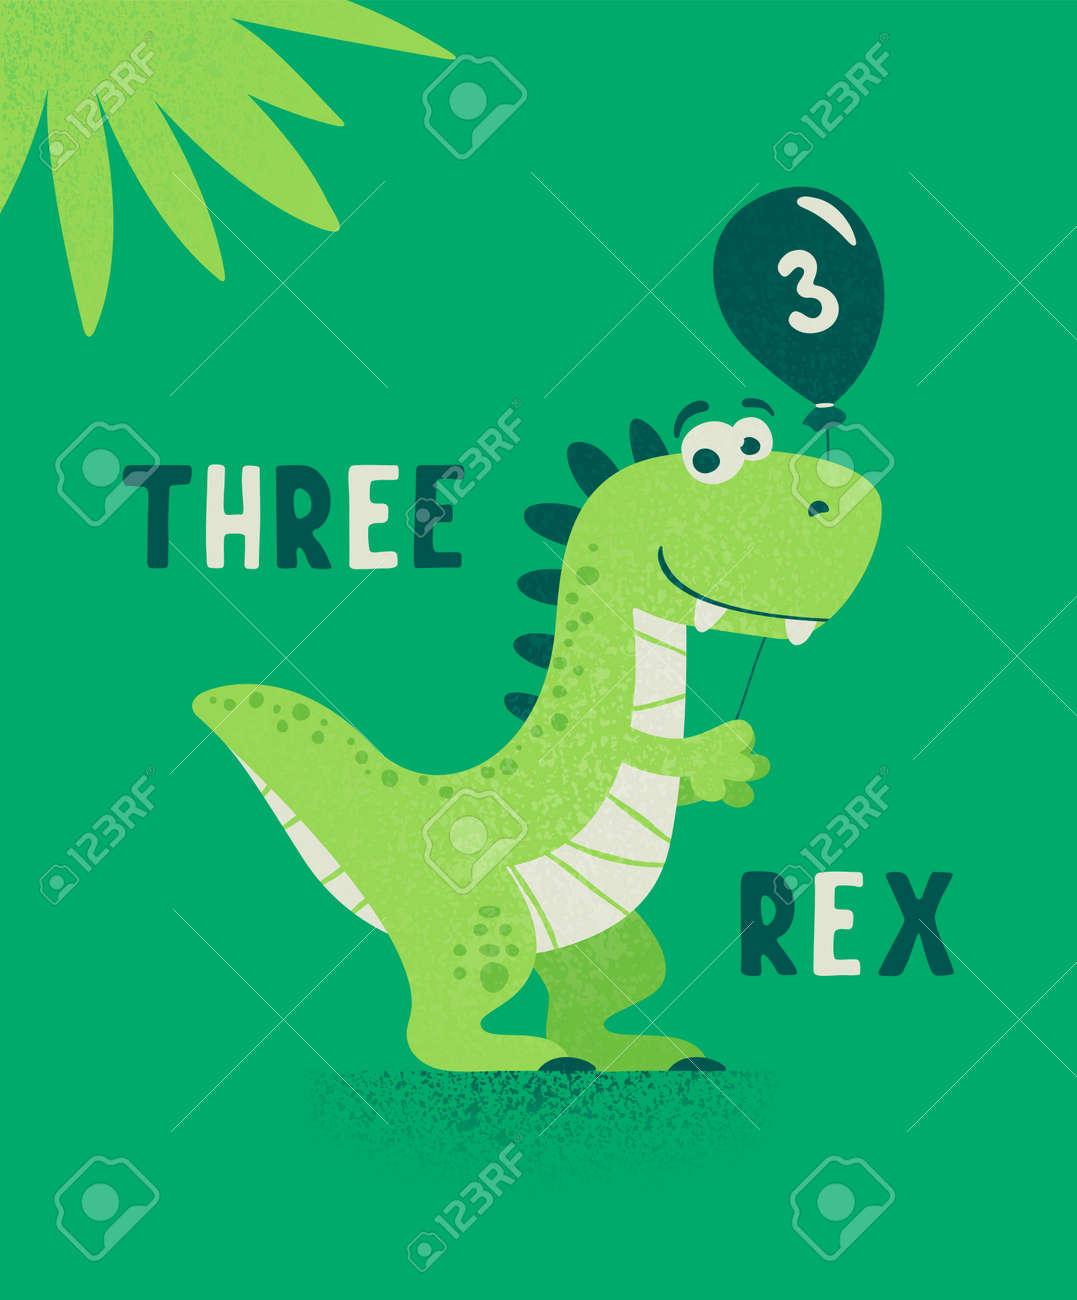 Dinosaur Tirannosaur Three Rex. Cartoon Tirex. Happy Birthday Card for a Child for Three Years. Vector Cute and Funny Cartoon Hand Drawn Dinosaur Holding Balloon. Kids, Children s Illustration, Print - 172640069